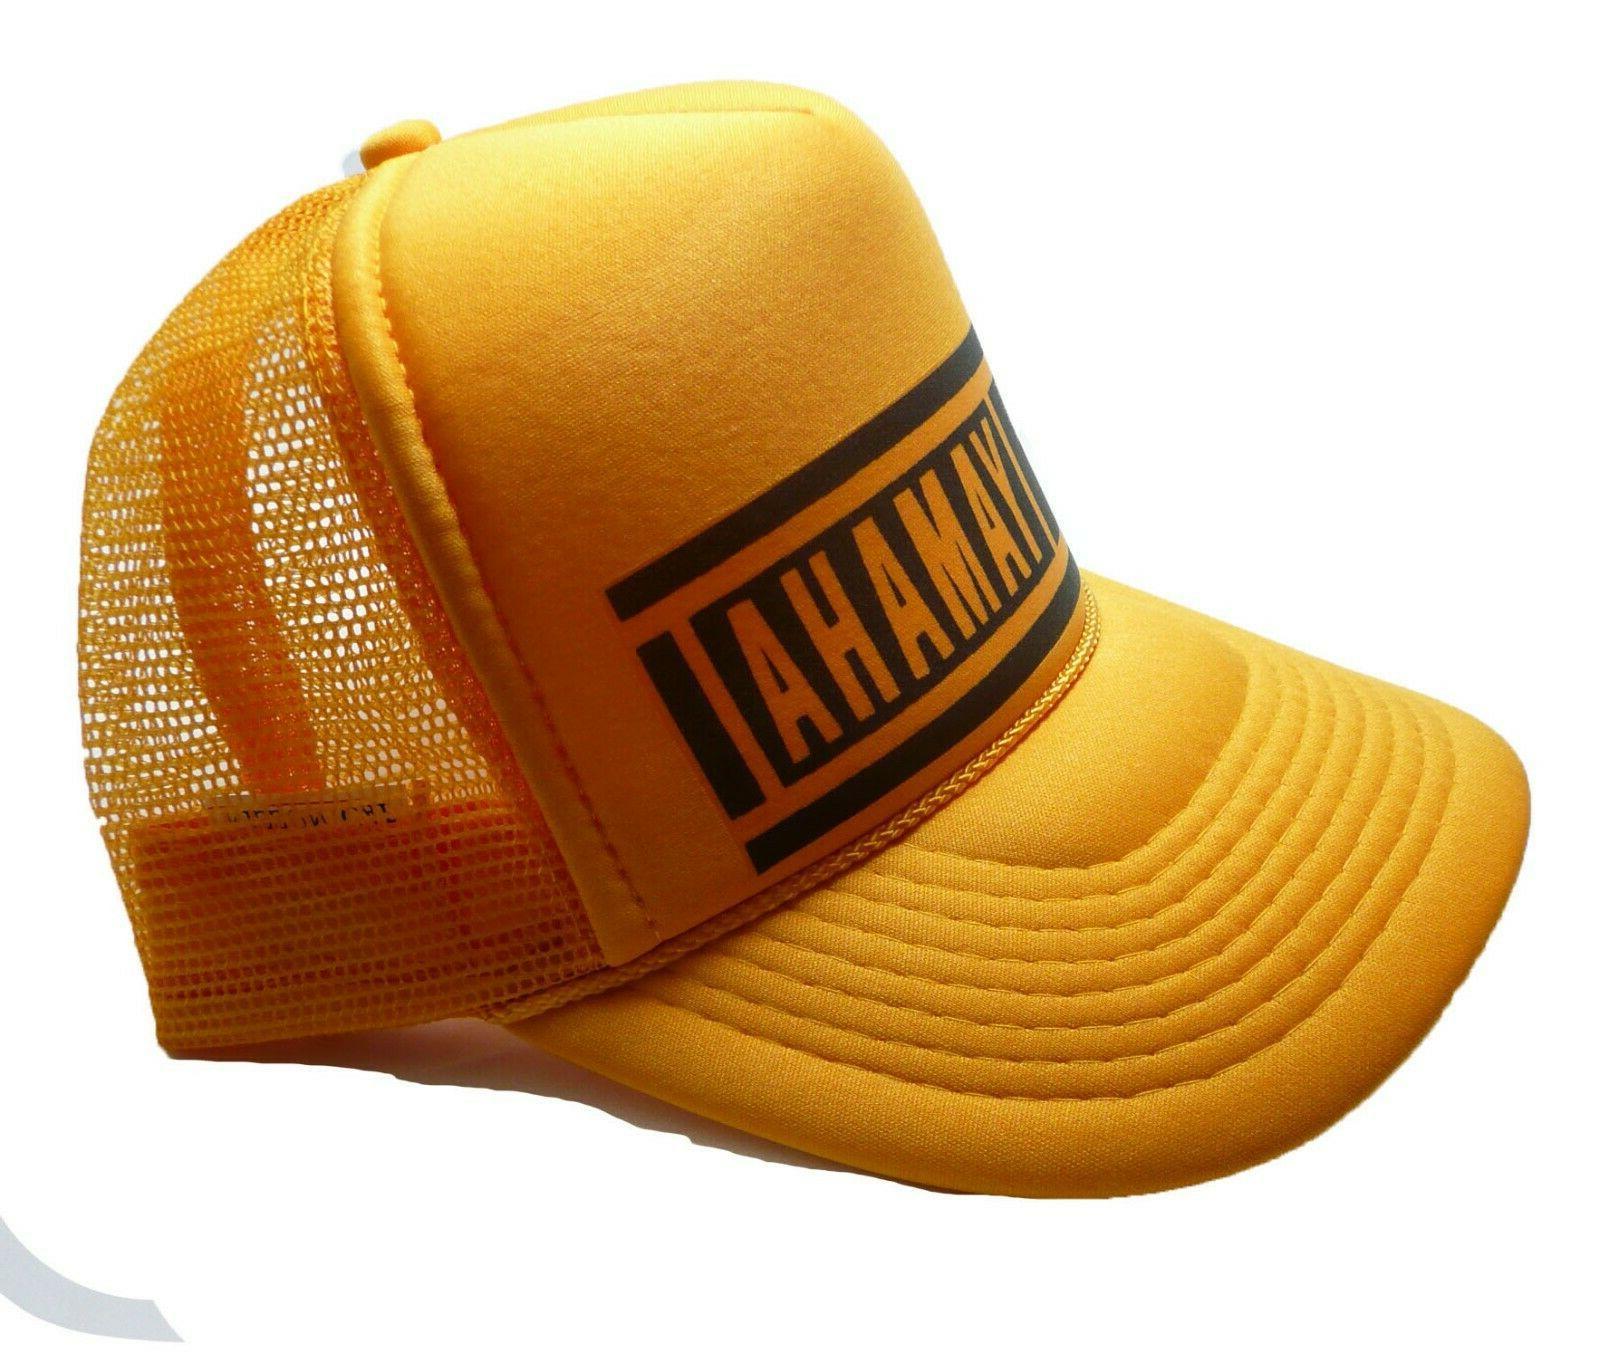 Vintage 80's racing hat snapback cap yellow New